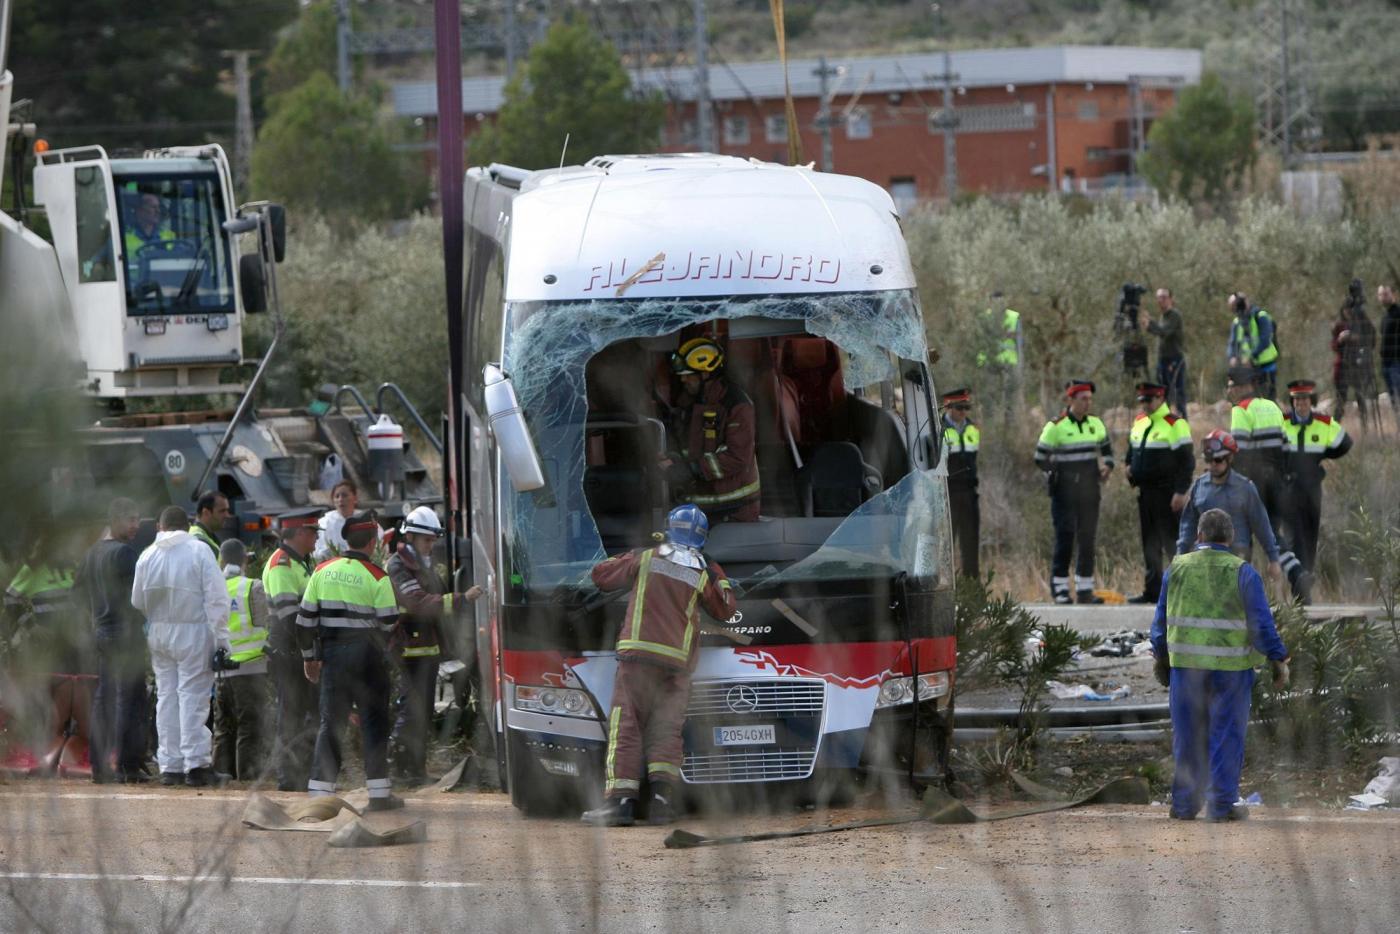 Spagna si schianta bus di studenti erasmus a Tarragona